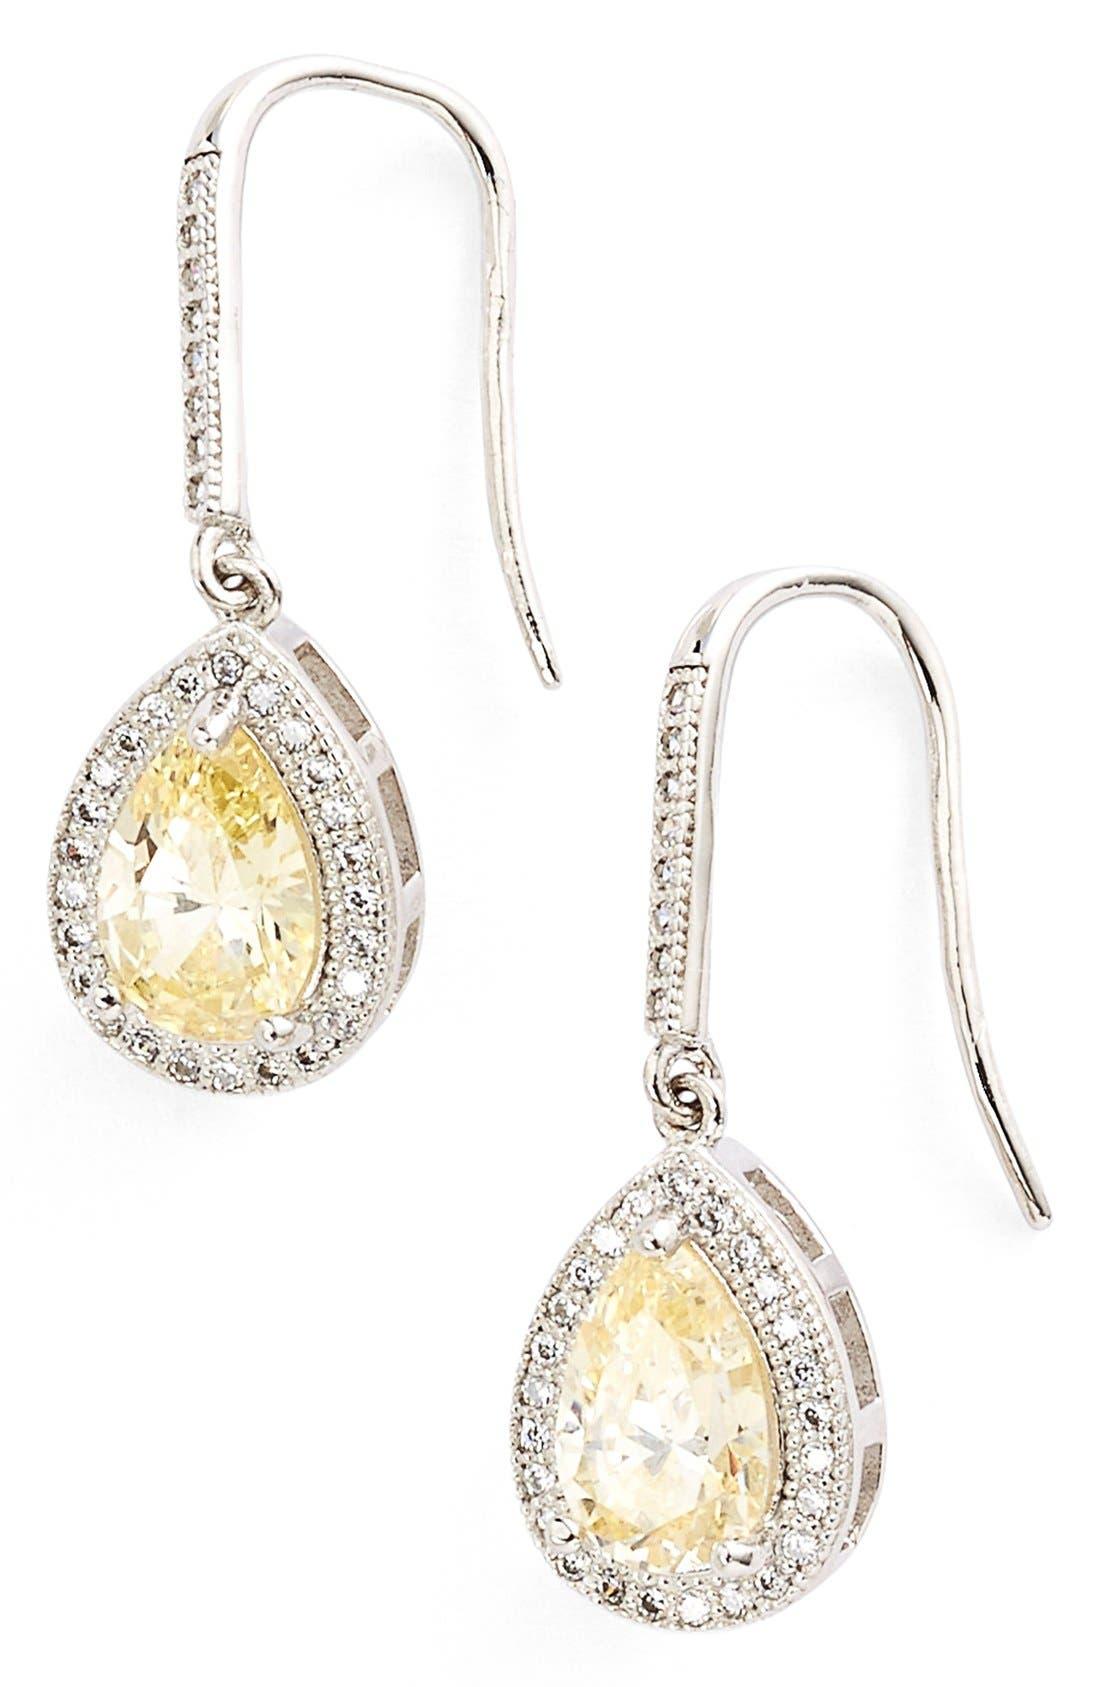 Alternate Image 1 Selected - Lafonn'Lassaire' Canary Drop Earrings